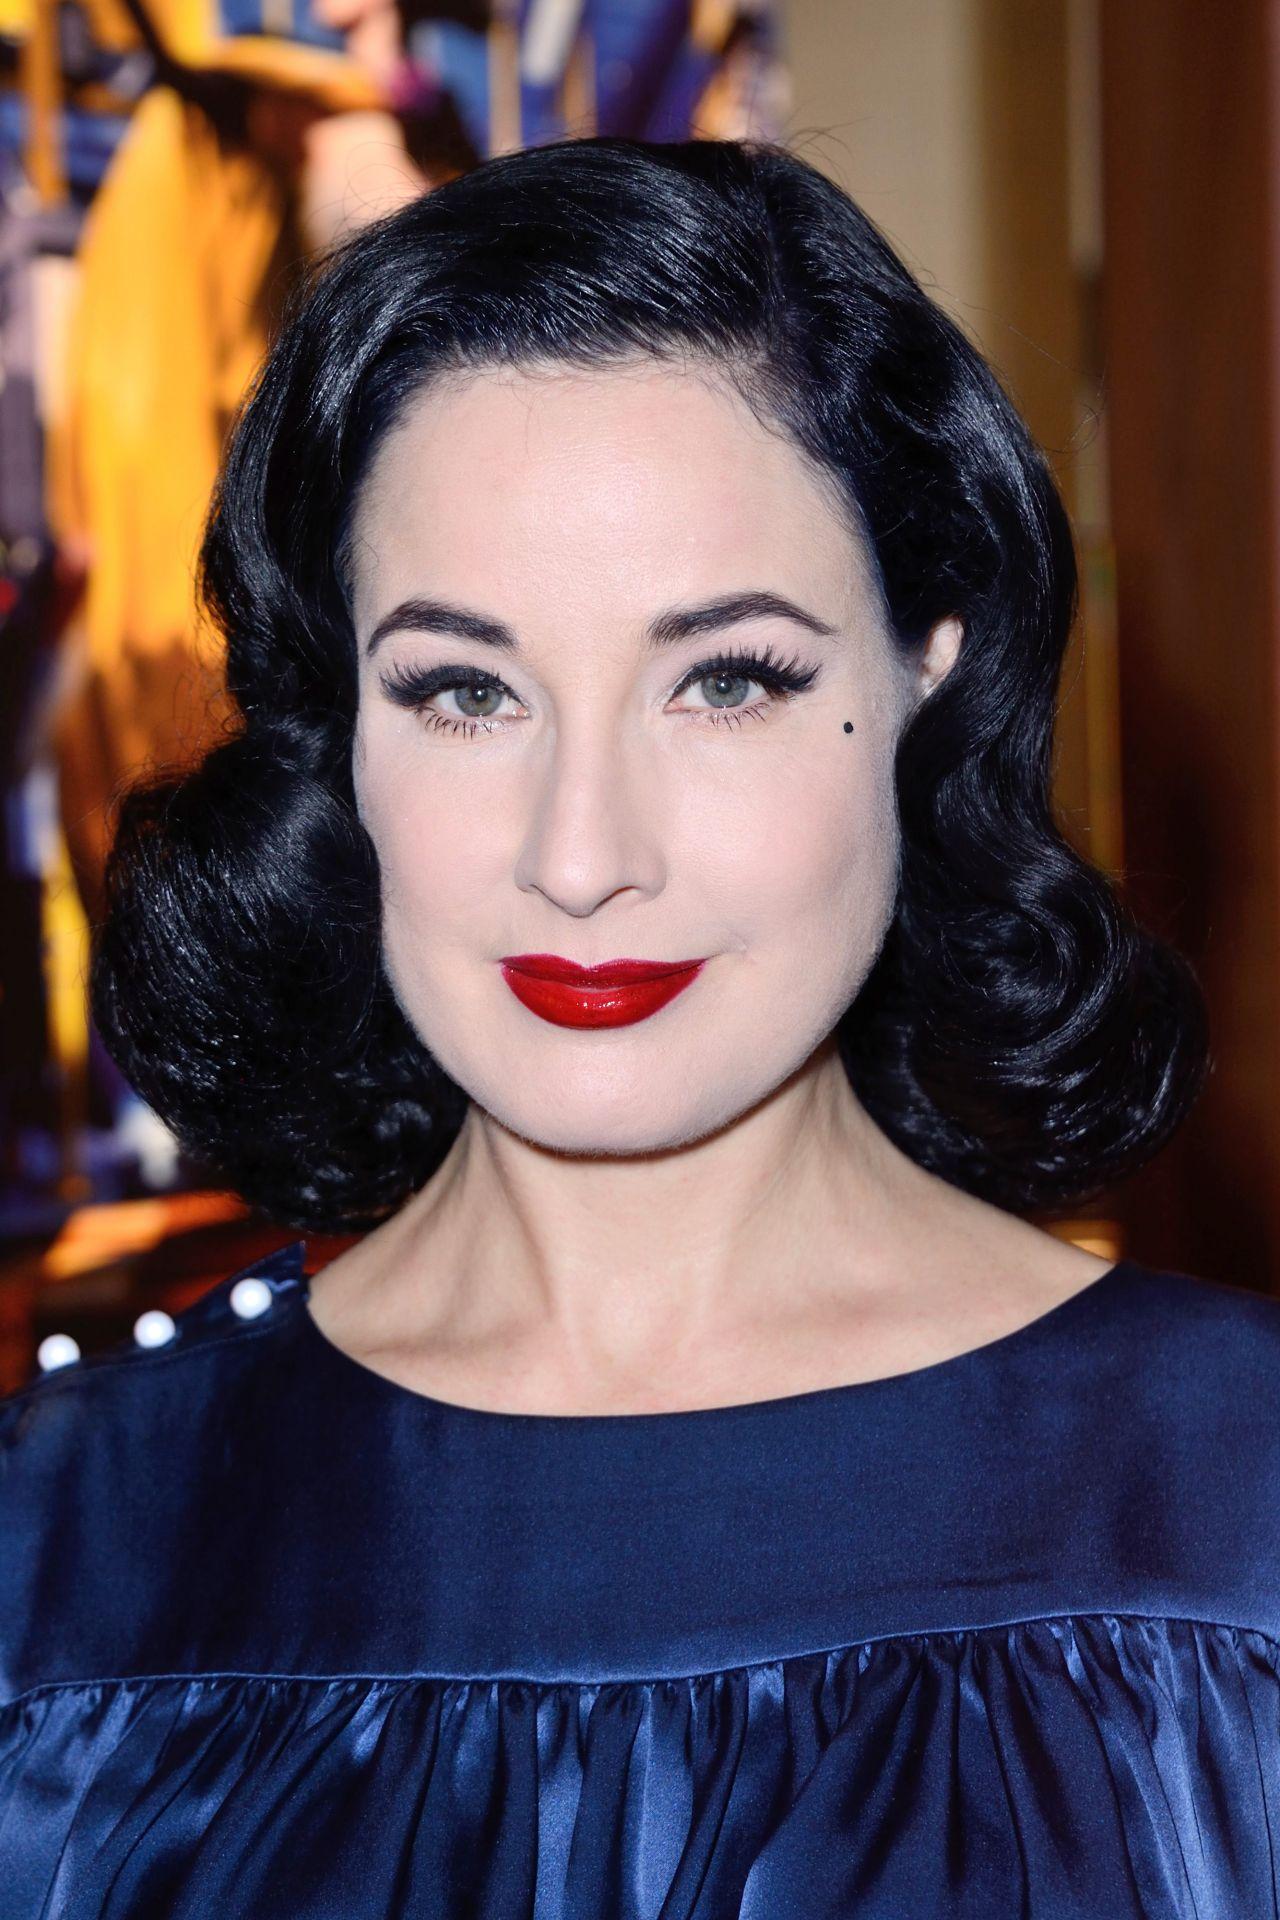 Dita Von Teese - Glamorama Celebrities by Ali Mahdavi ... Dita Von Teese